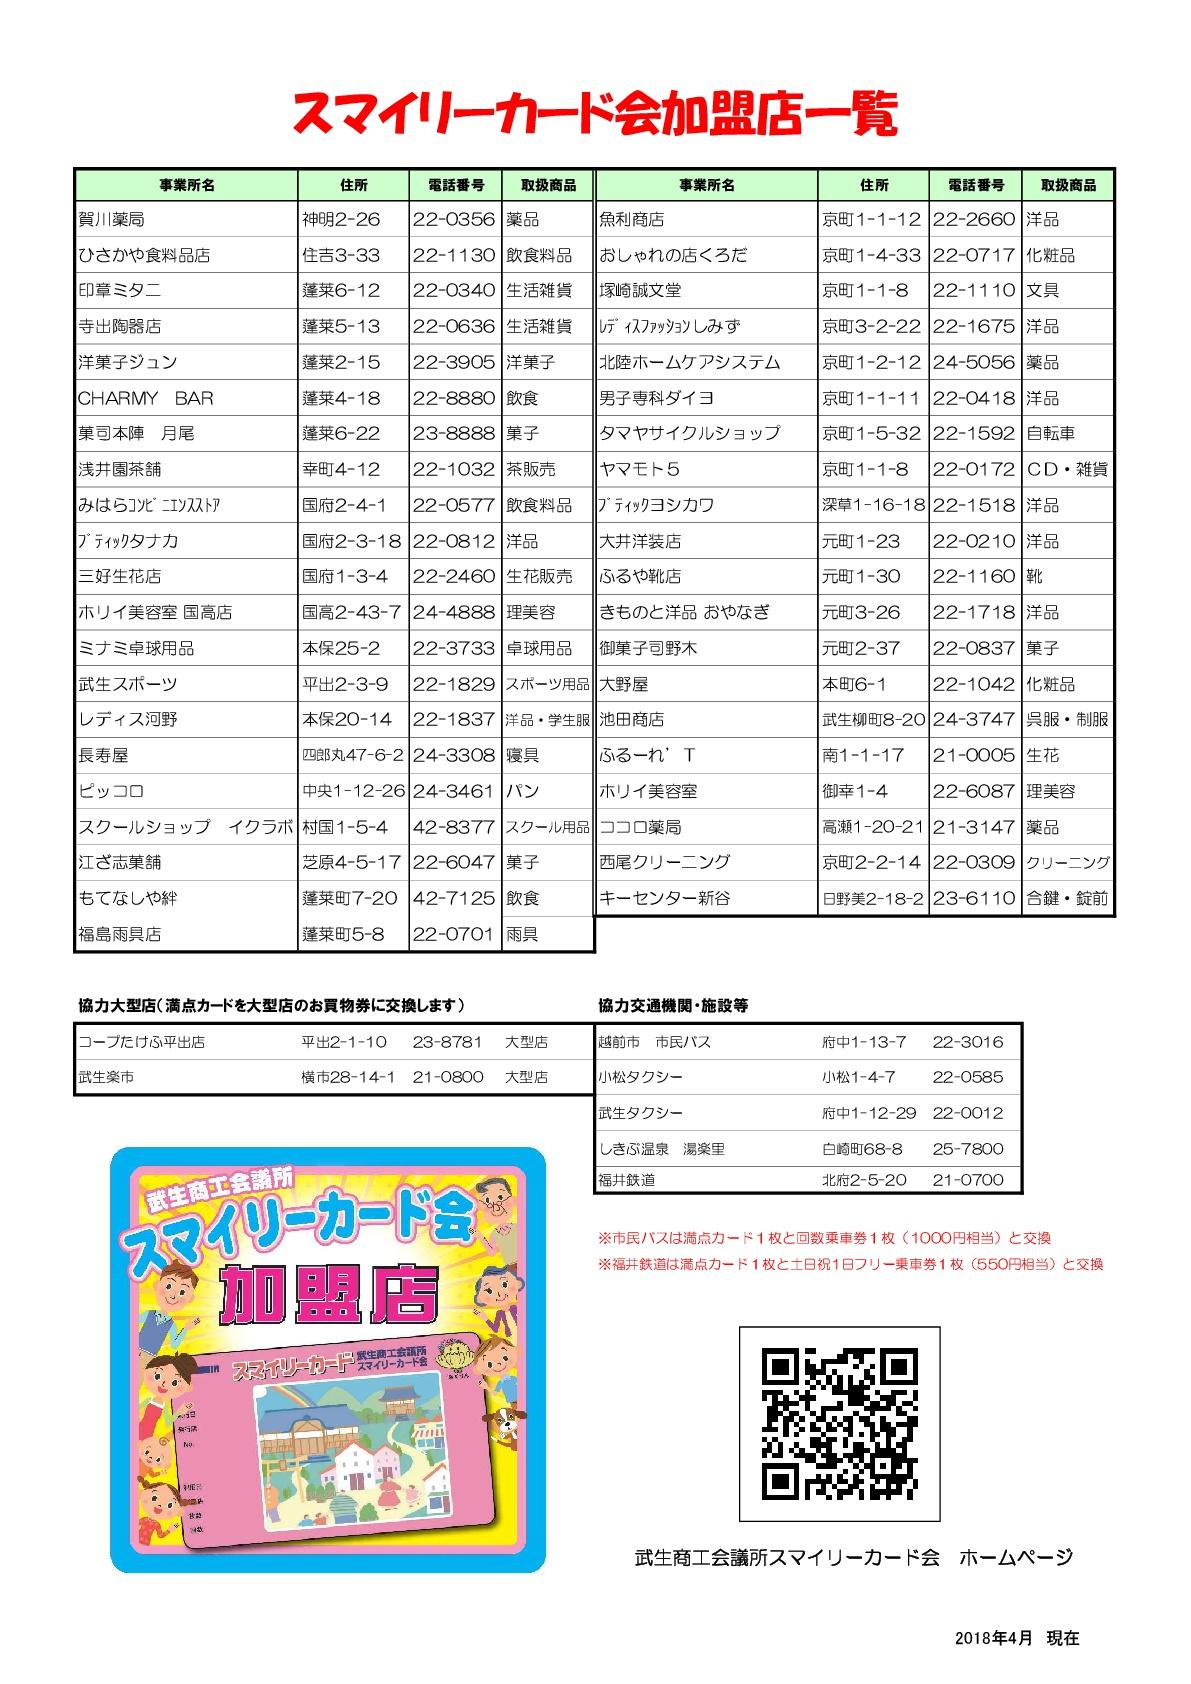 HP用加盟店リスト.jpg